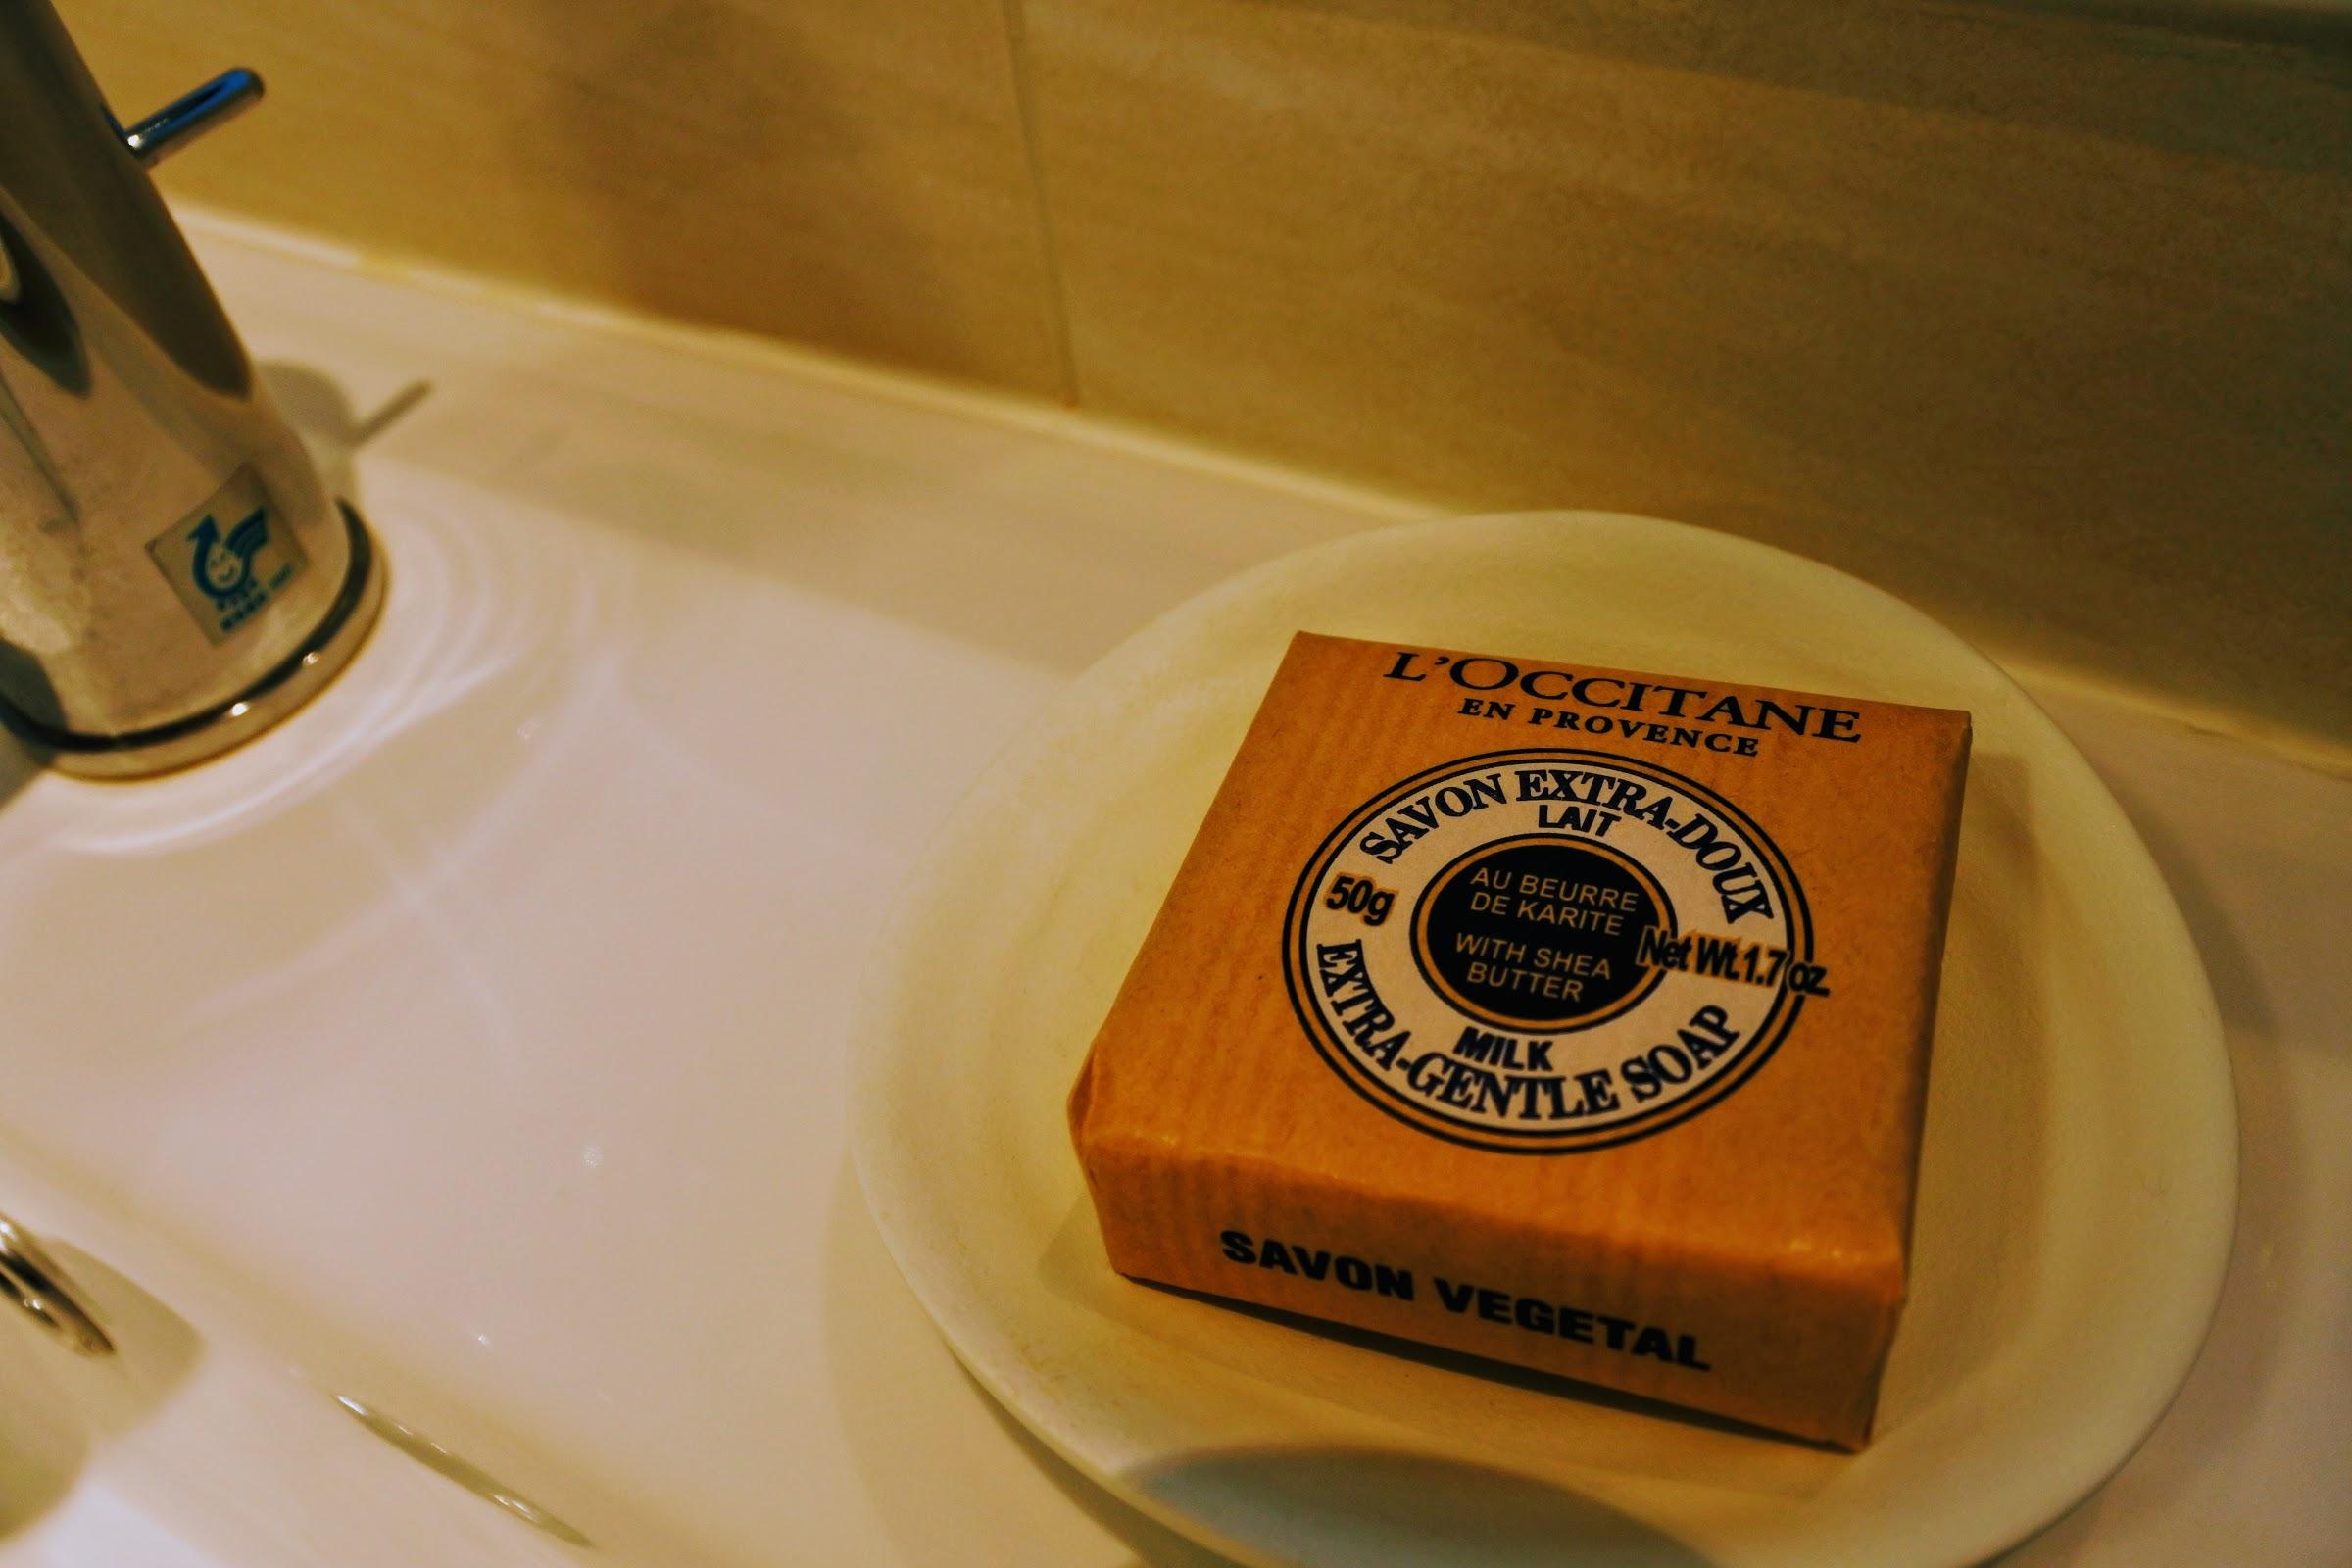 L'occitane products!